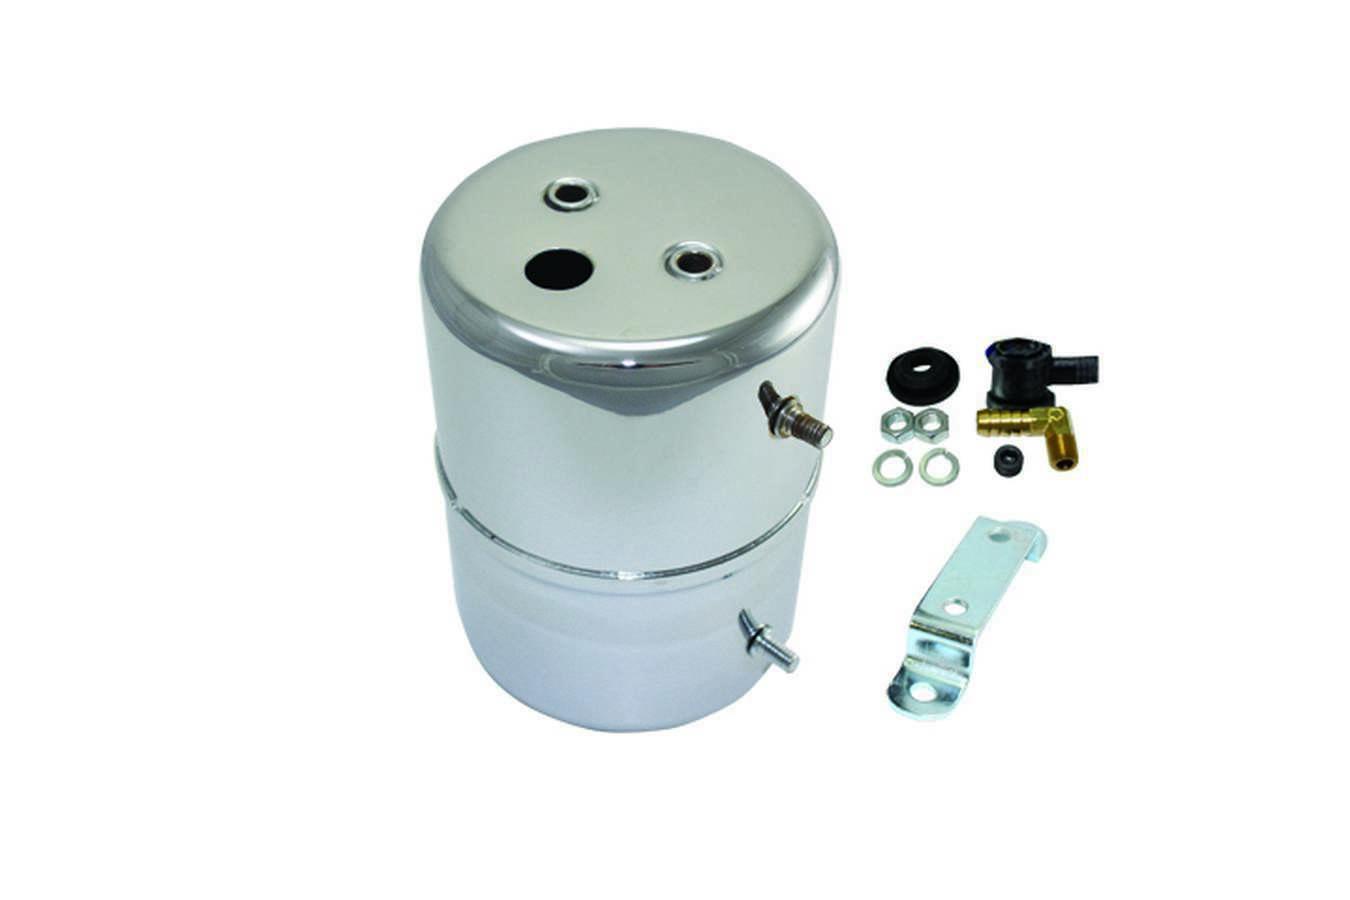 Vacuum Reservoir Tank wi th Hardware Chrome Steel